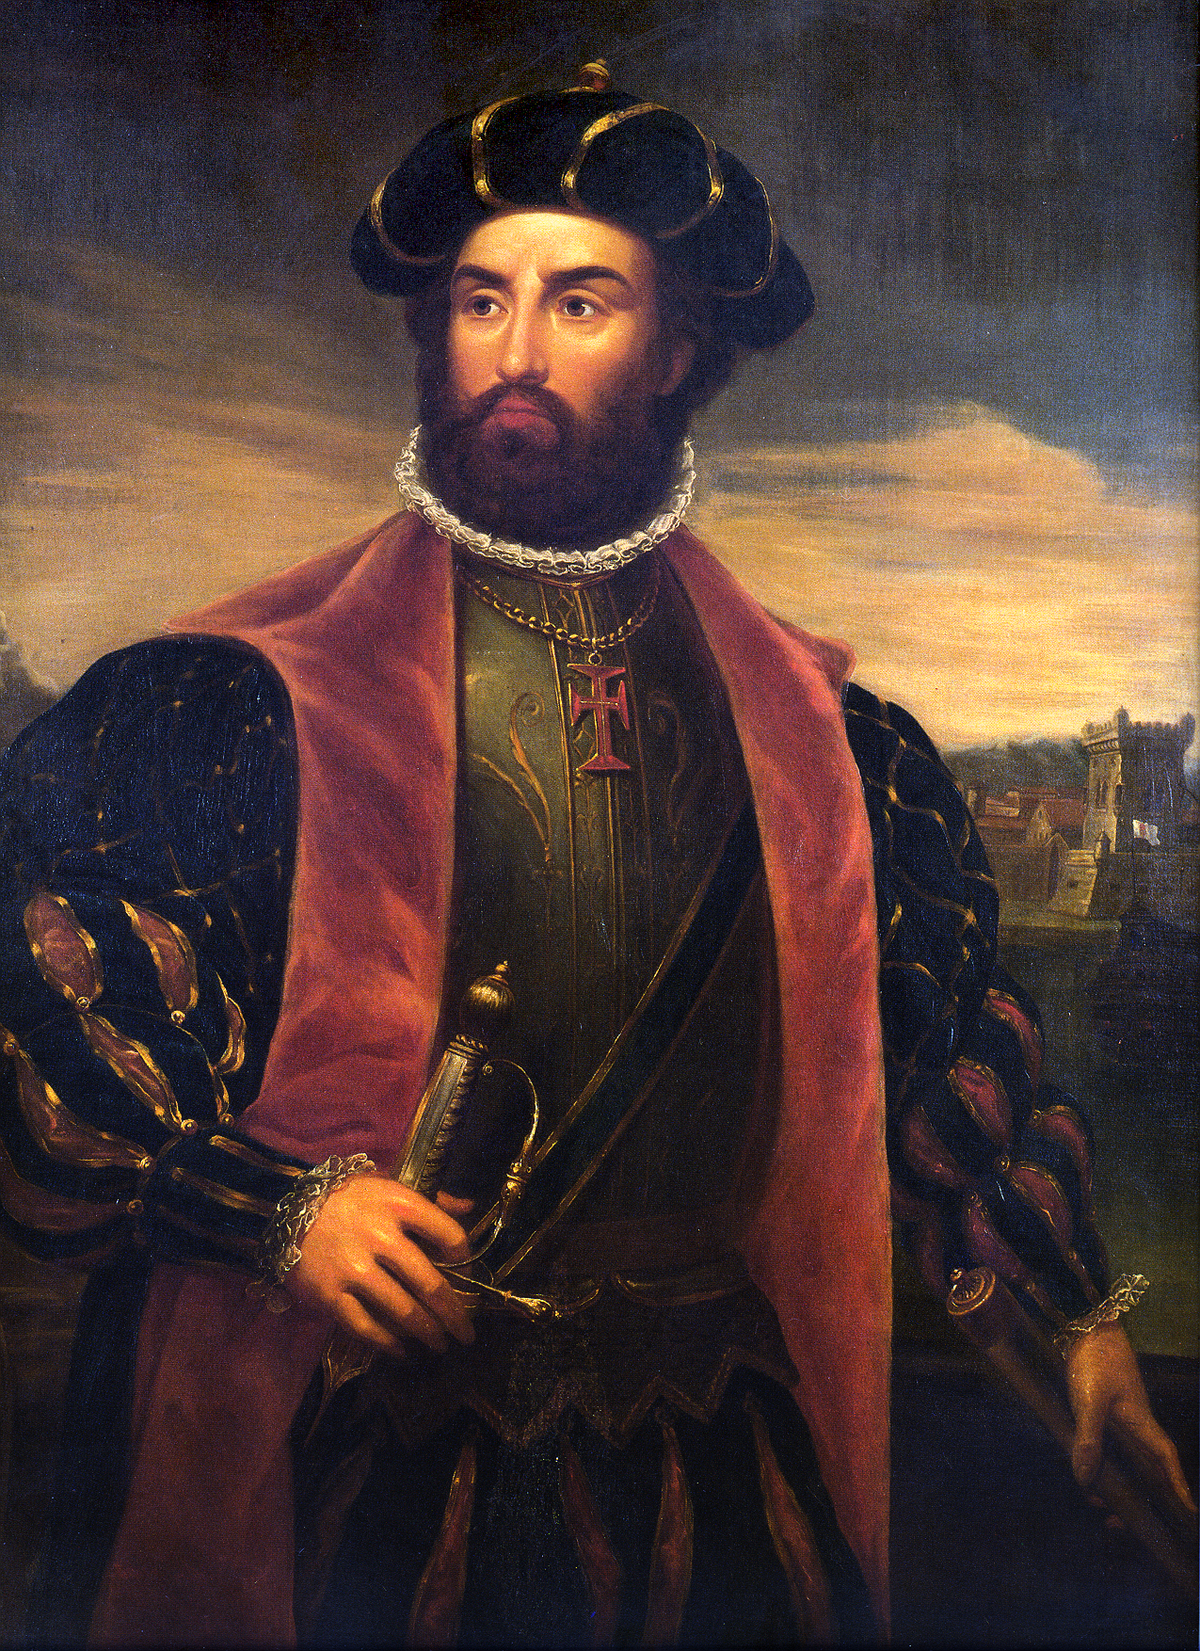 Vasco da Gama - Wikipedia